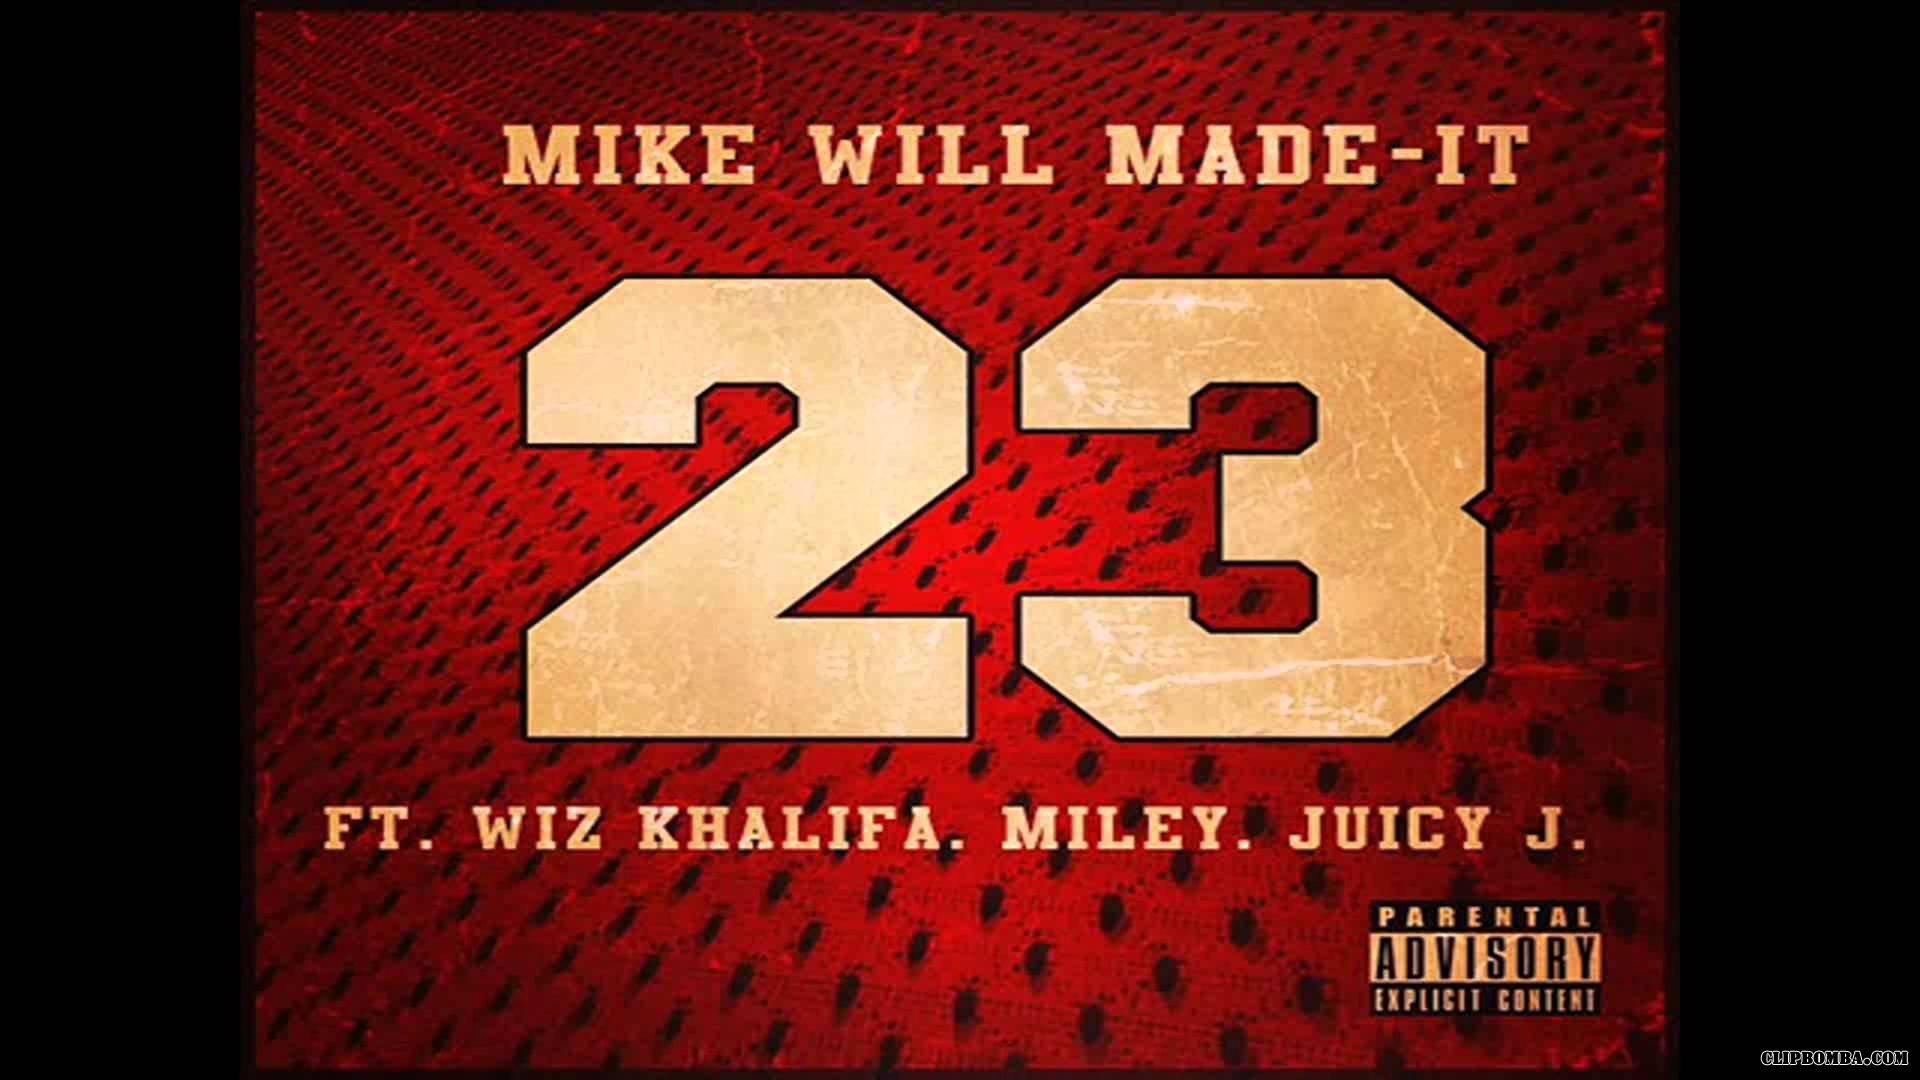 Miley Cyrus feat. Wiz Khalifa & Juicy J - 23 (2013)